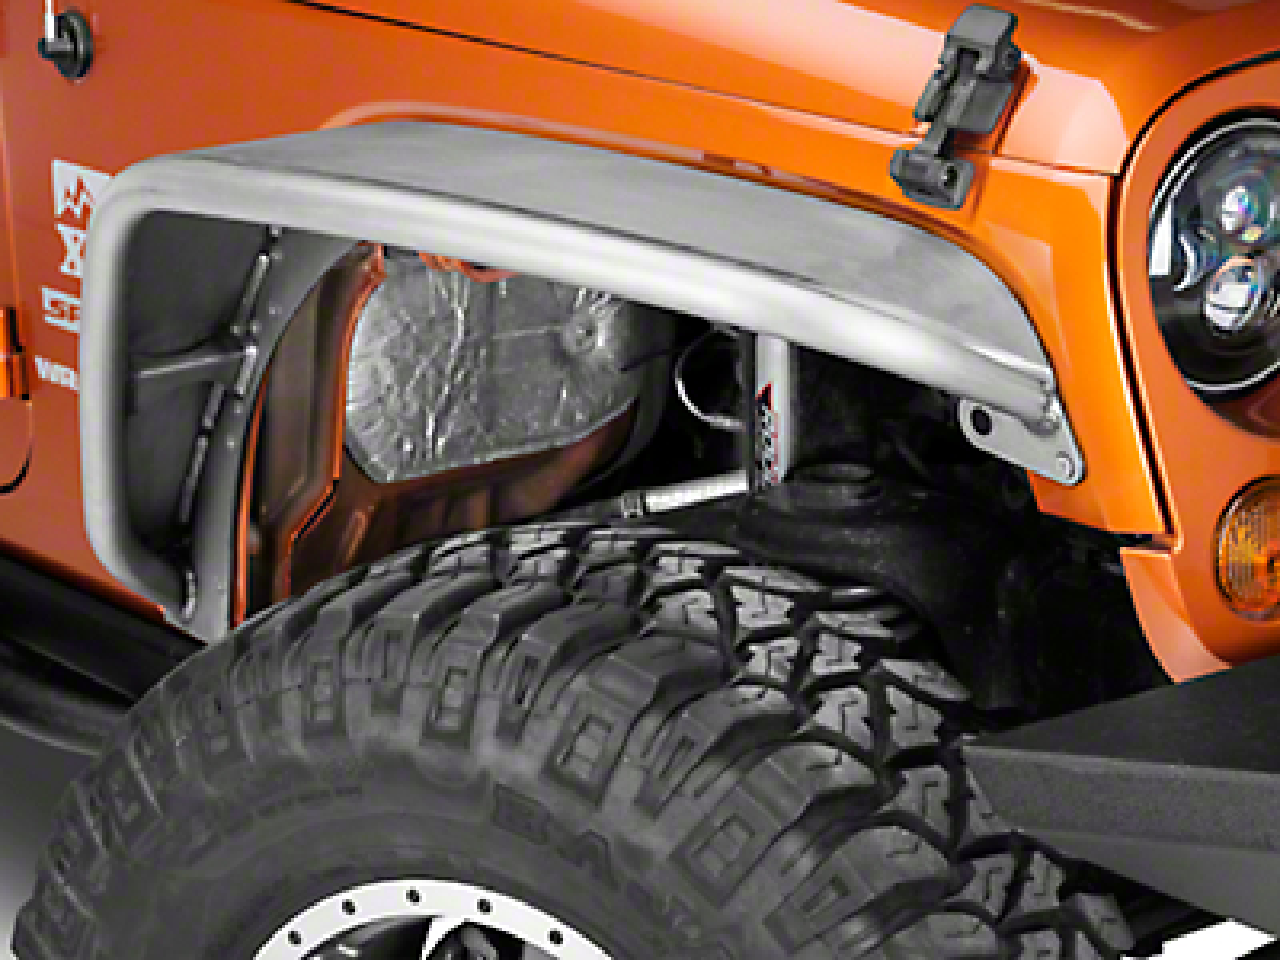 Poison Spyder Standard Width Crusher Fender Flares - Bare Steel (07-18 Jeep Wrangler JK)